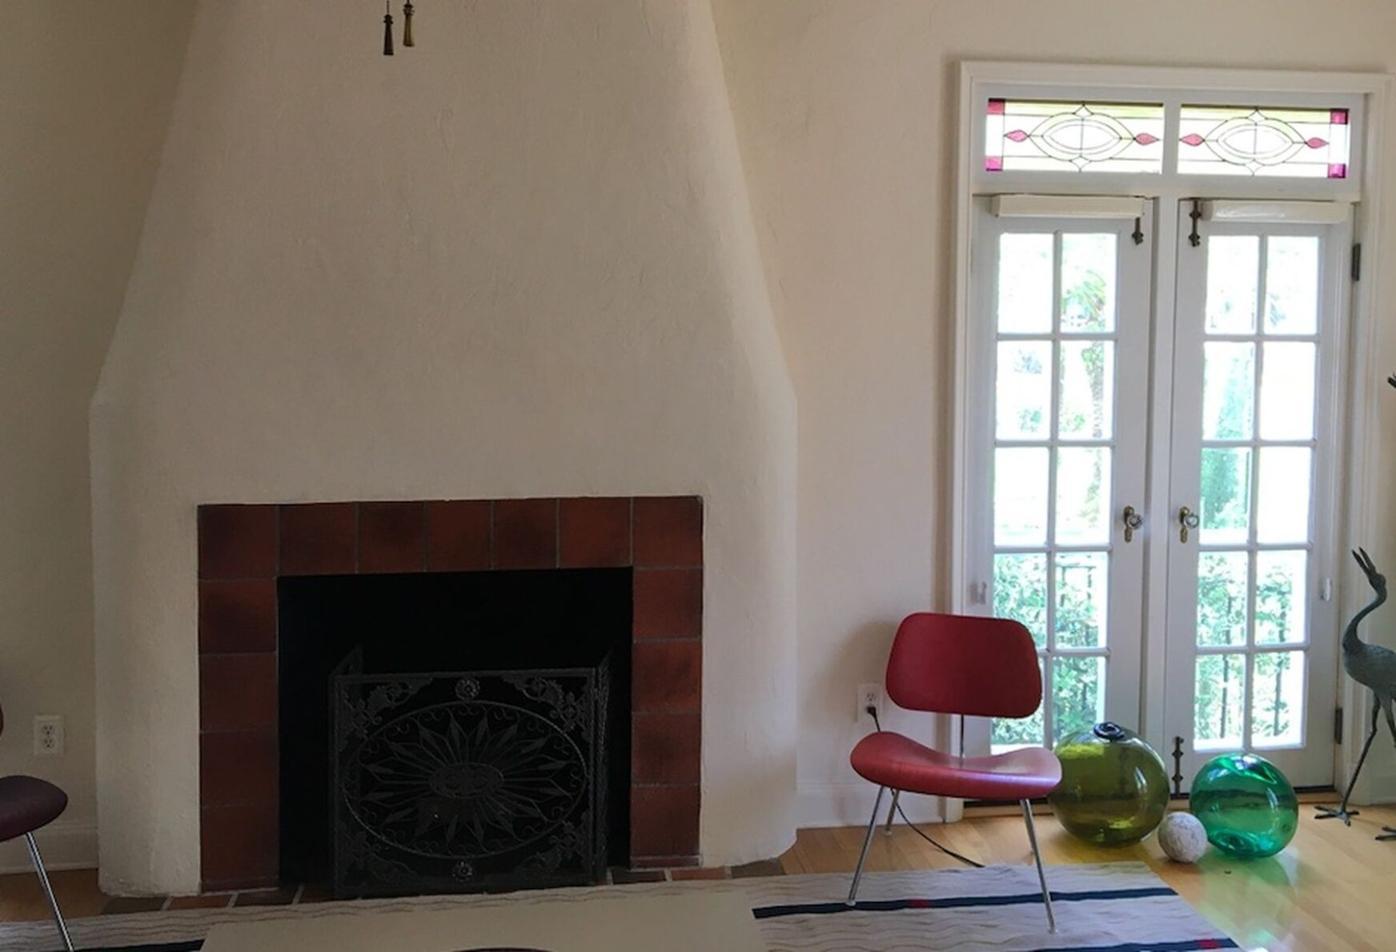 Fireplace was changed - twice